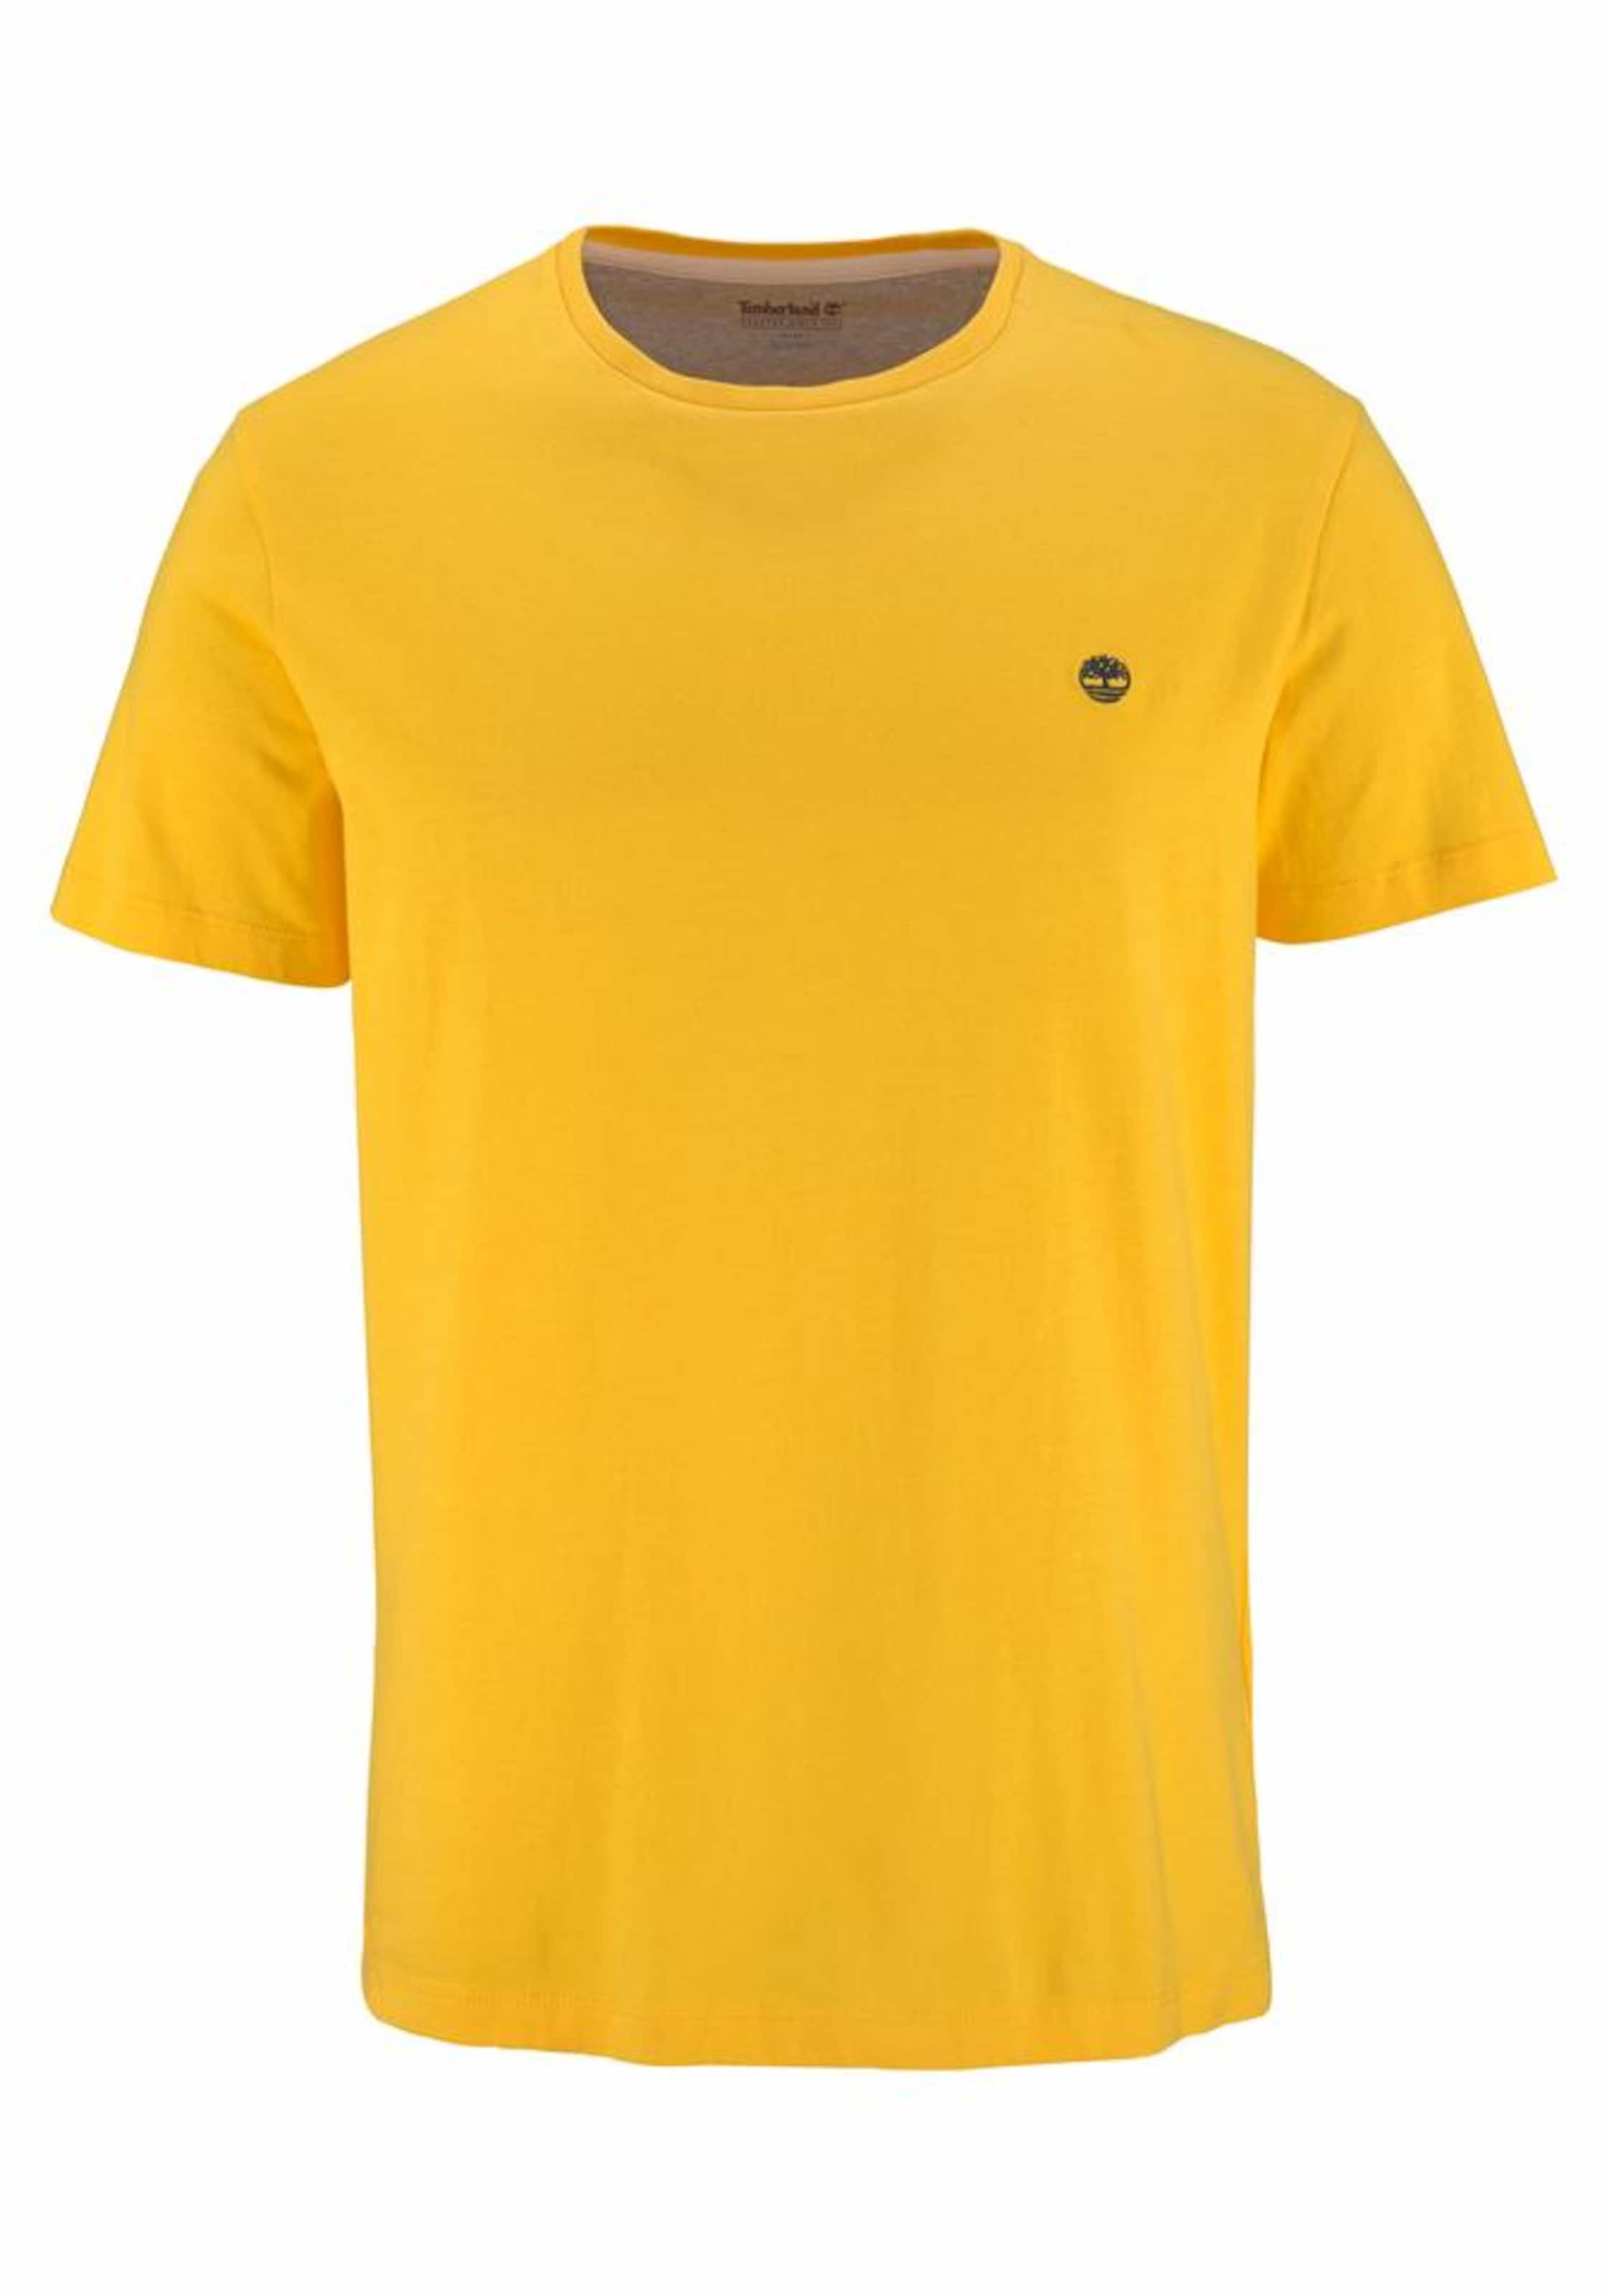 Steckdose Niedrigsten Preis TIMBERLAND T-Shirt Outlet Besten Preise ErEk9